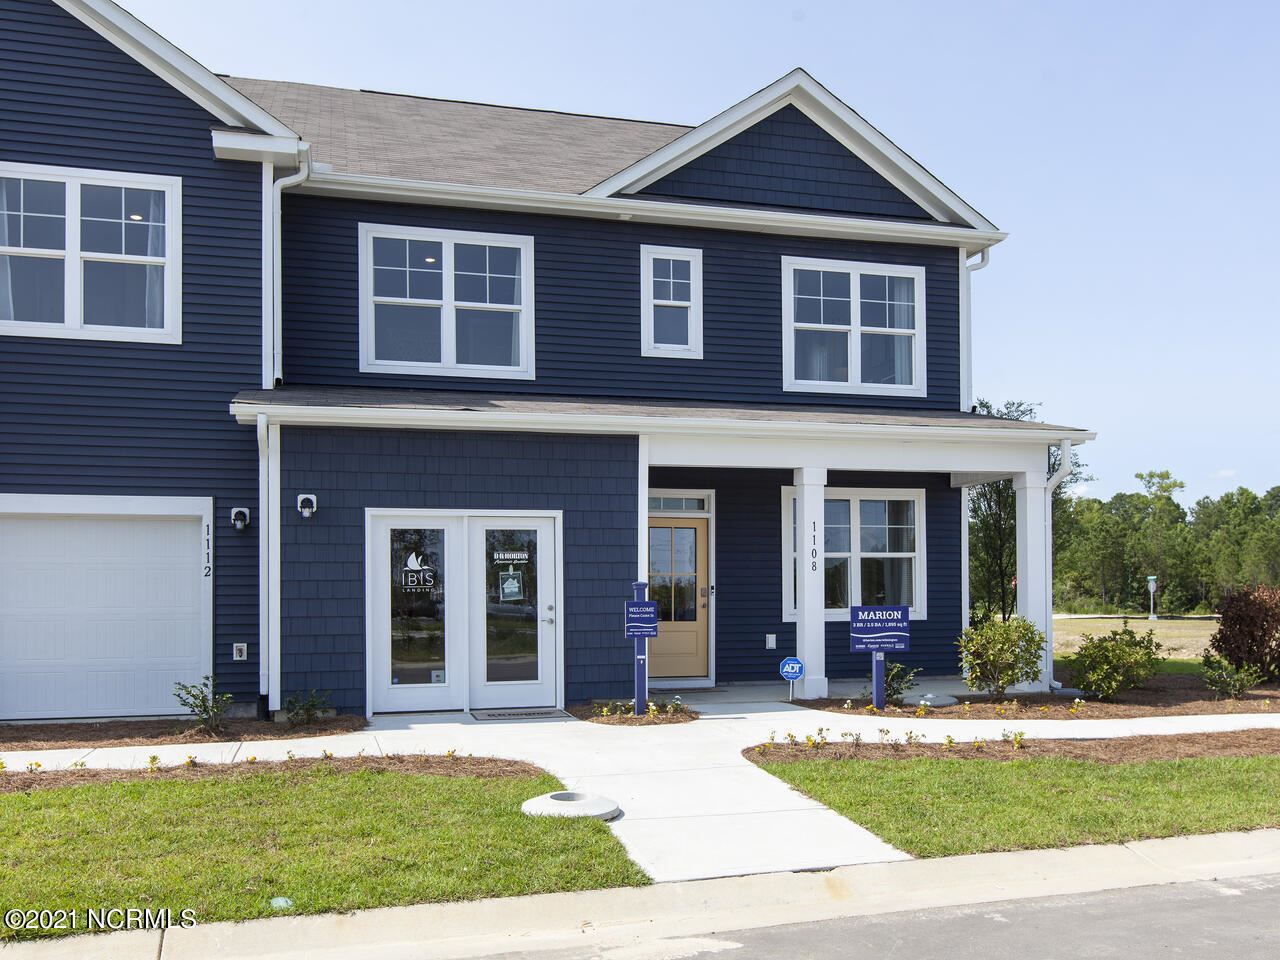 Photo of 4628 Wildaire Lane #Lot 16, Leland, NC 28451 (MLS # 100287965)